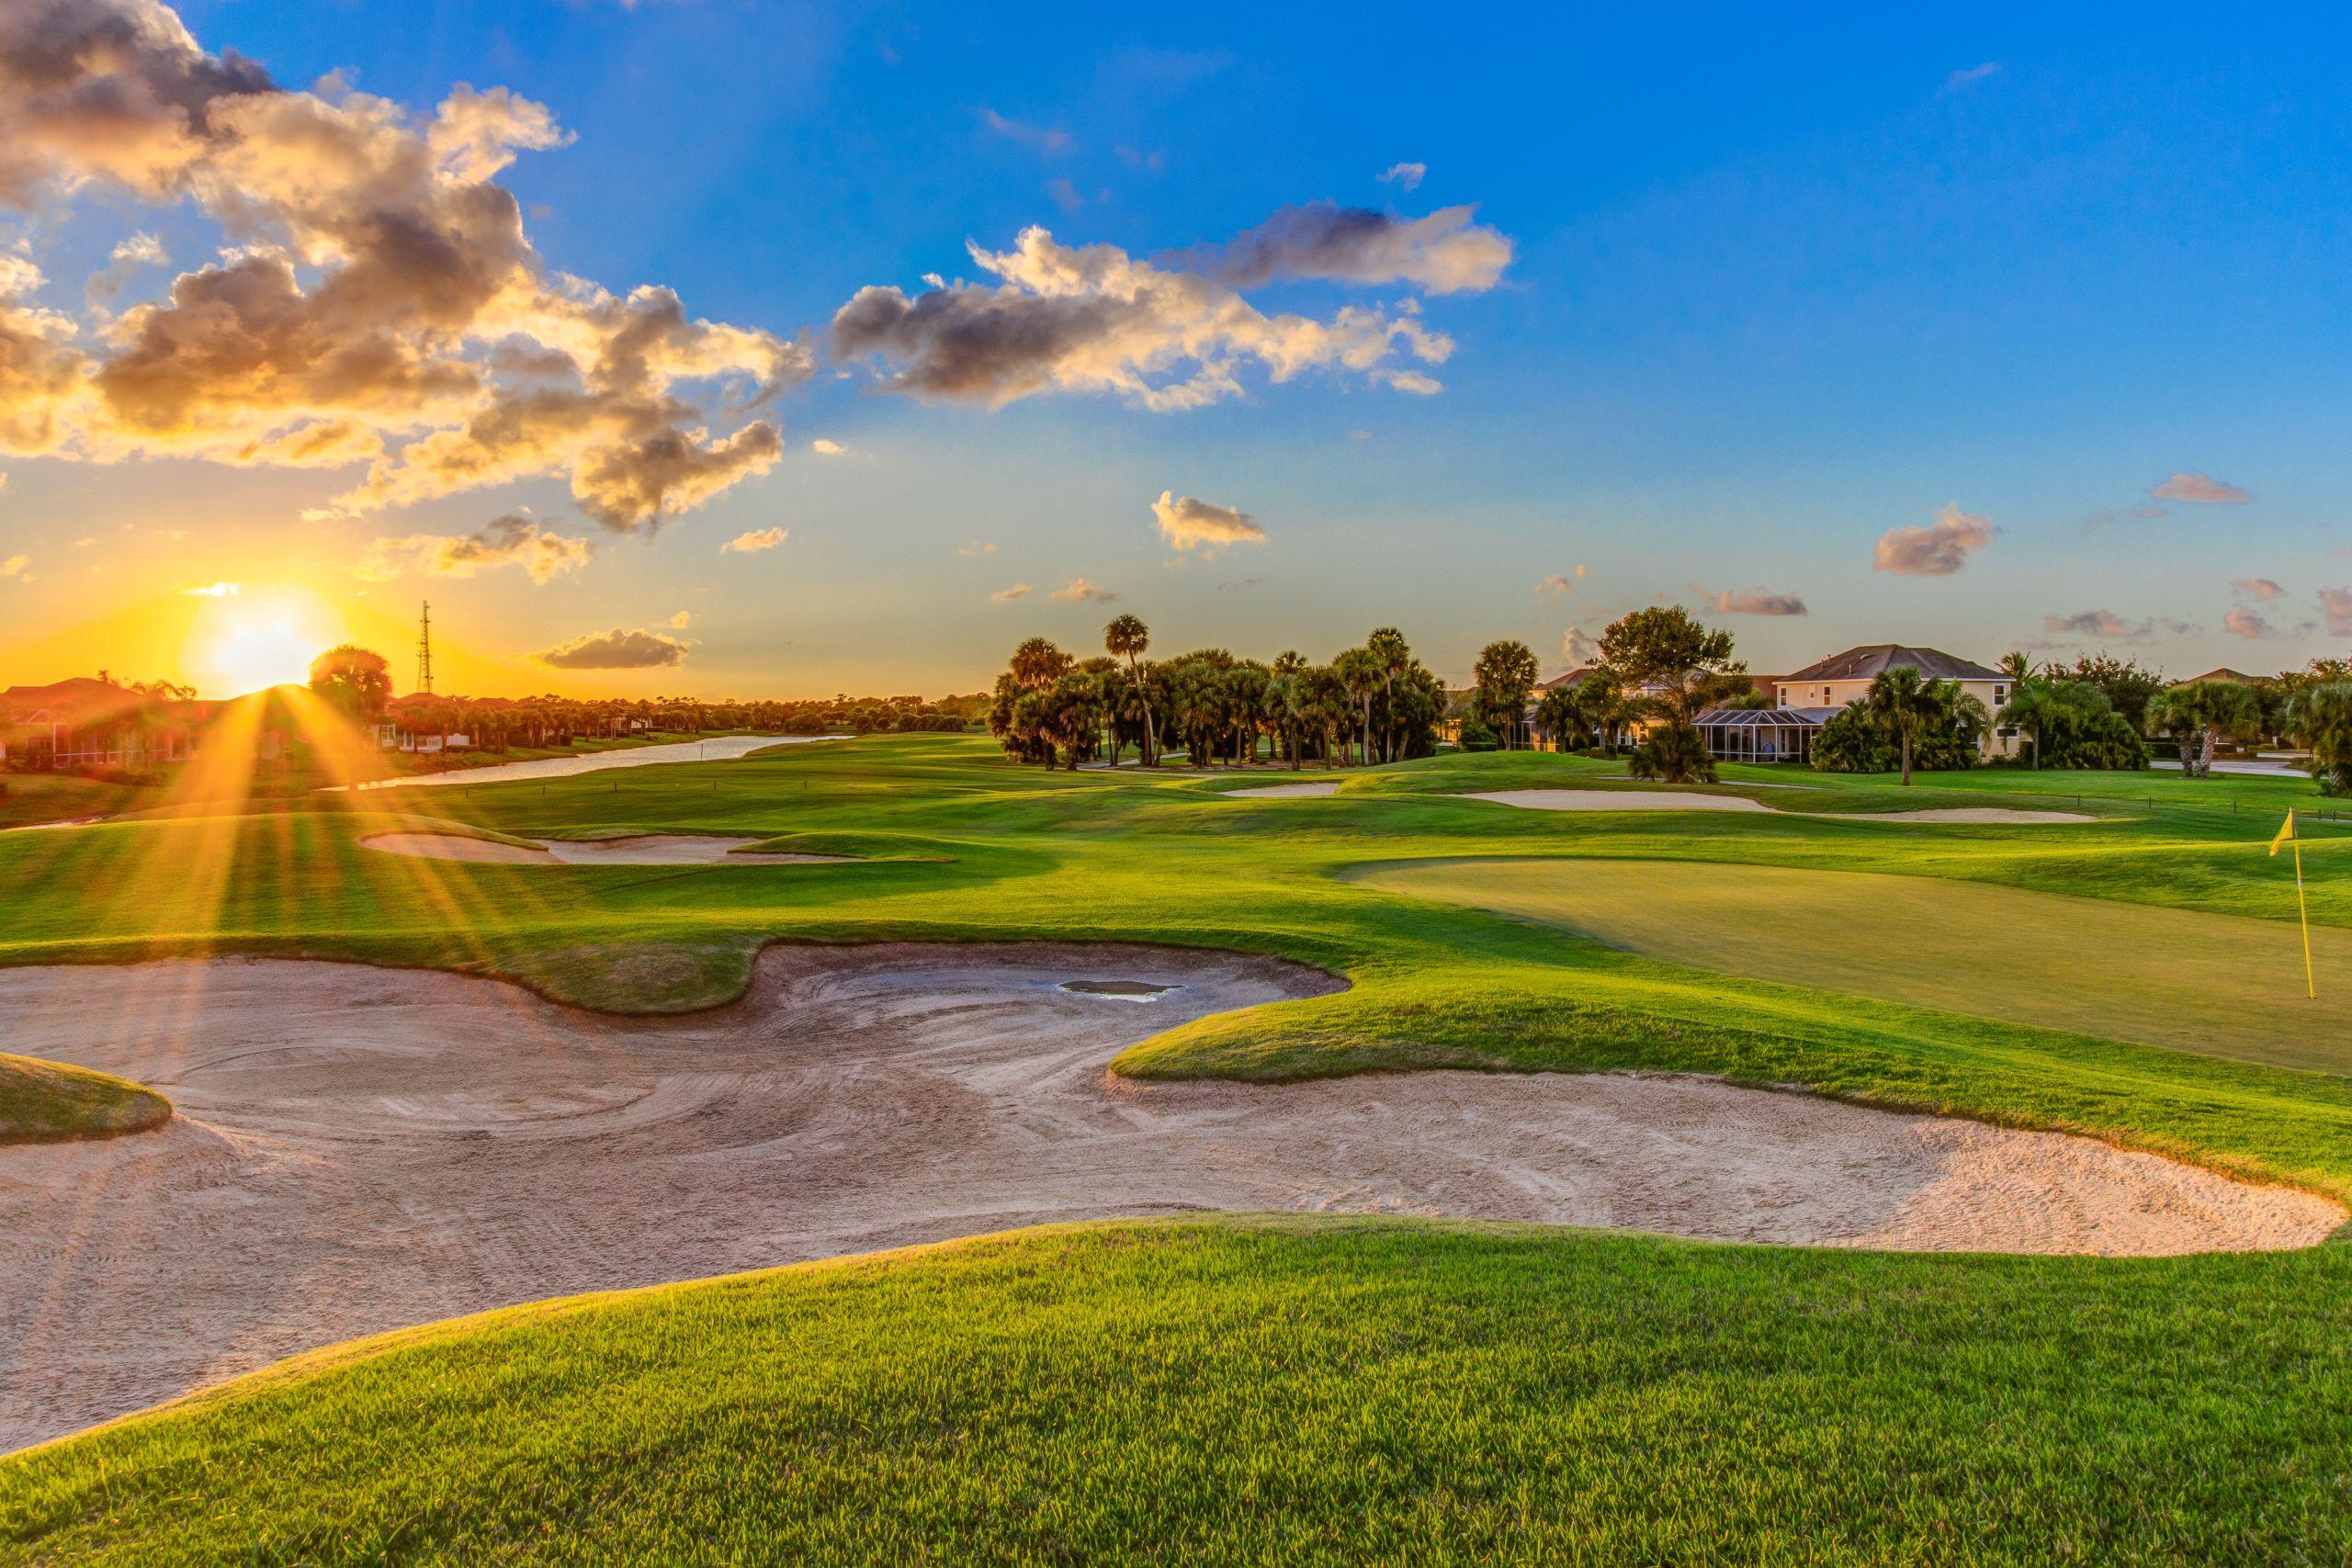 Pointe West Golf Course